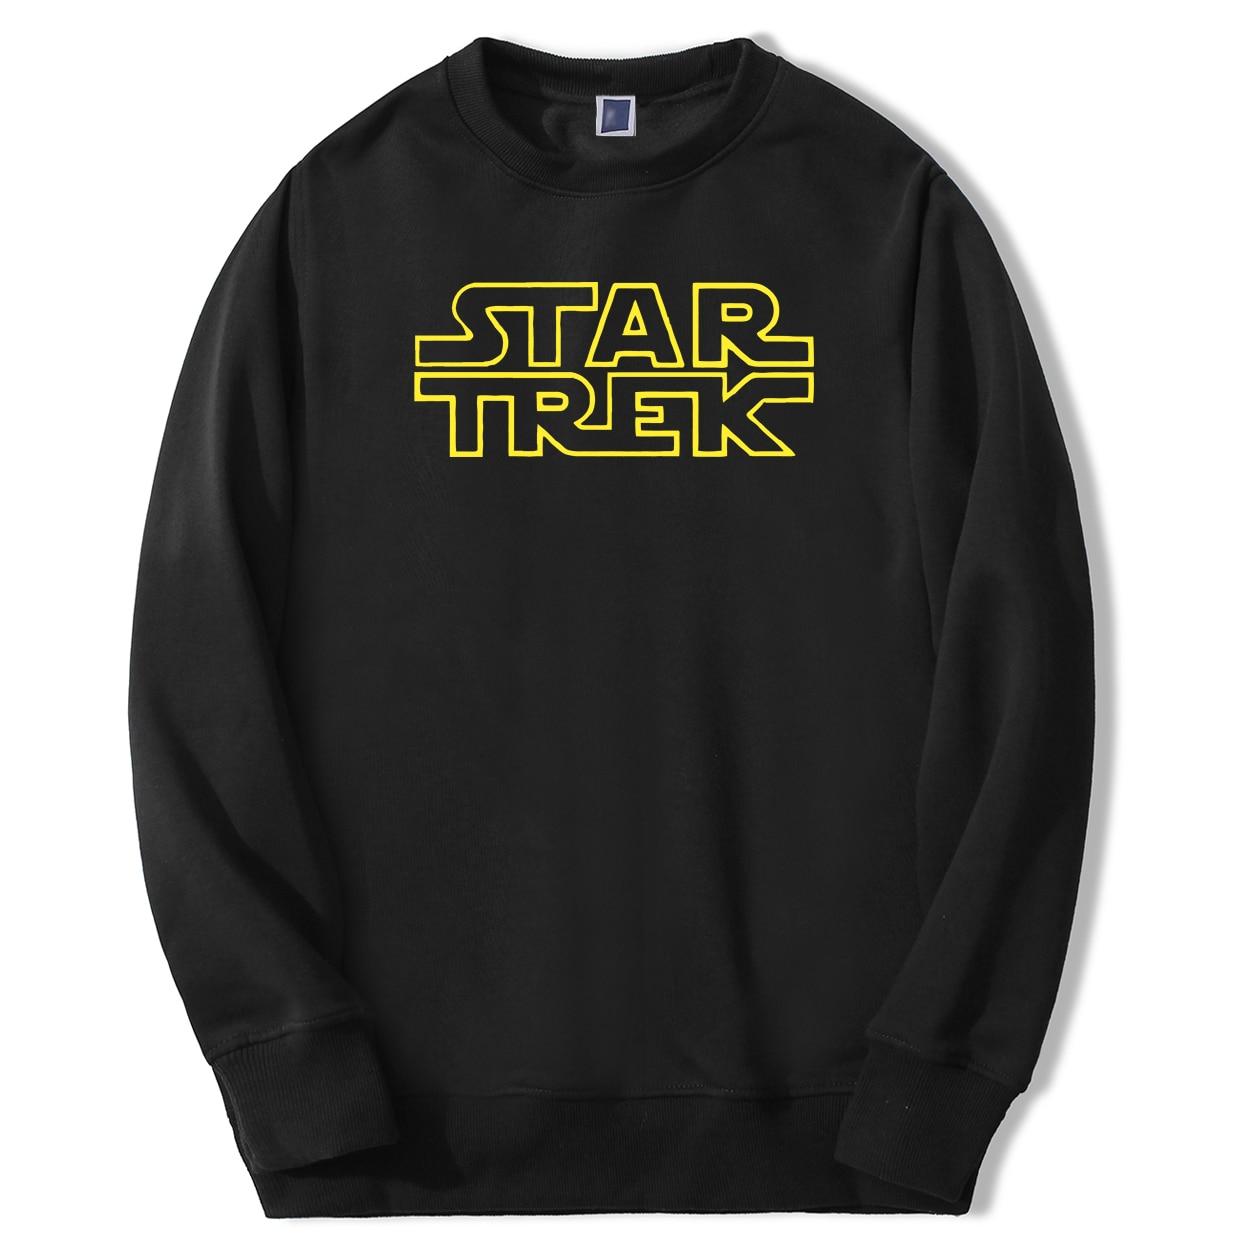 Star Trek Men's Sweatshirts Startrek Male Hoodies Sweatshirts 2020 Spring Autumn Fashion Starwars Hoodies Sweatshirt Man Tops(China)